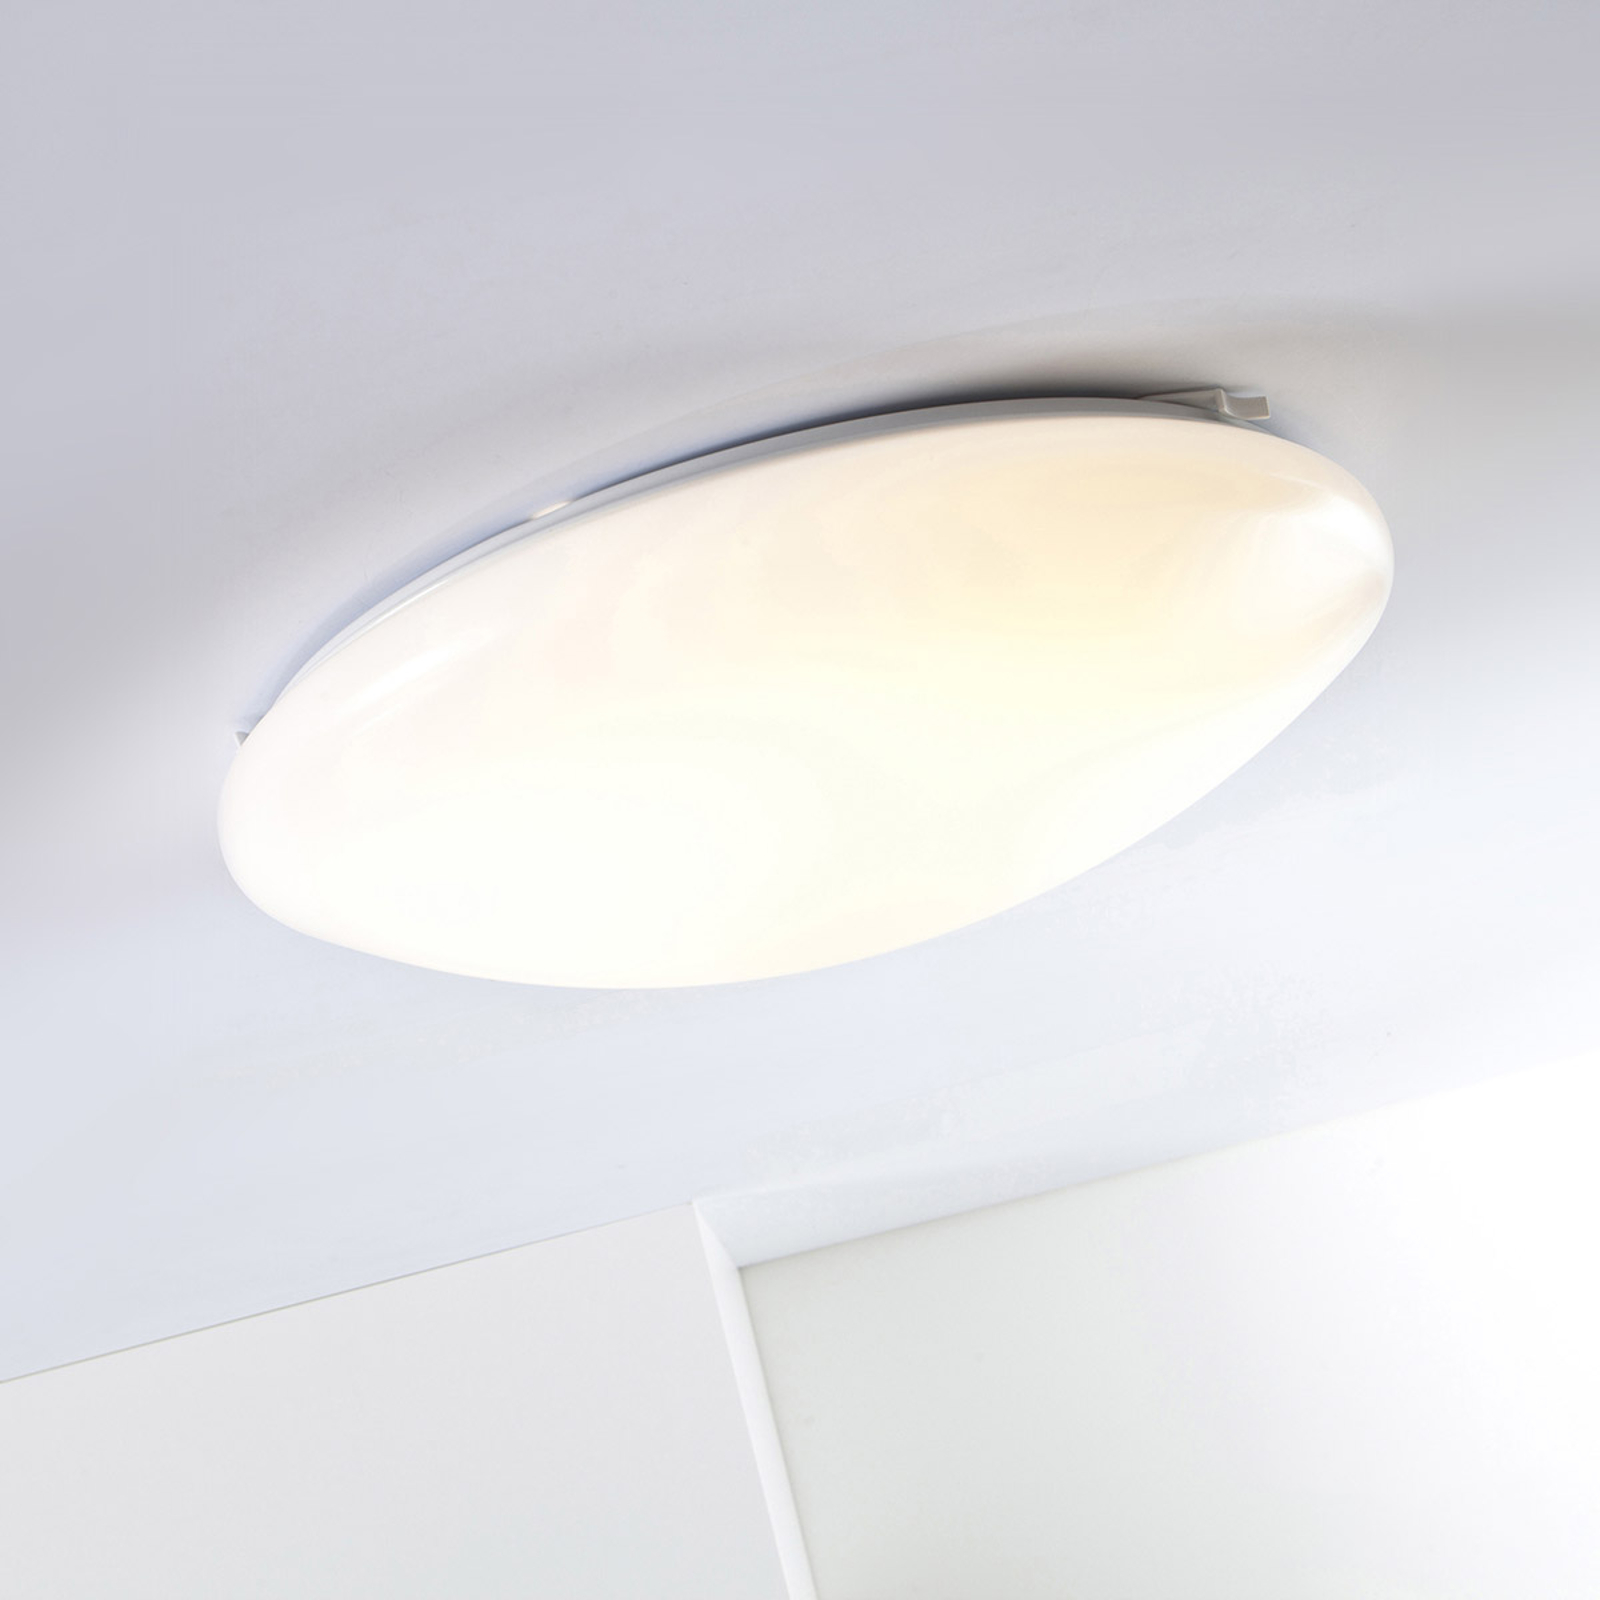 AEG LED Basic - pyöreä LED-kattolamppu, 22 W